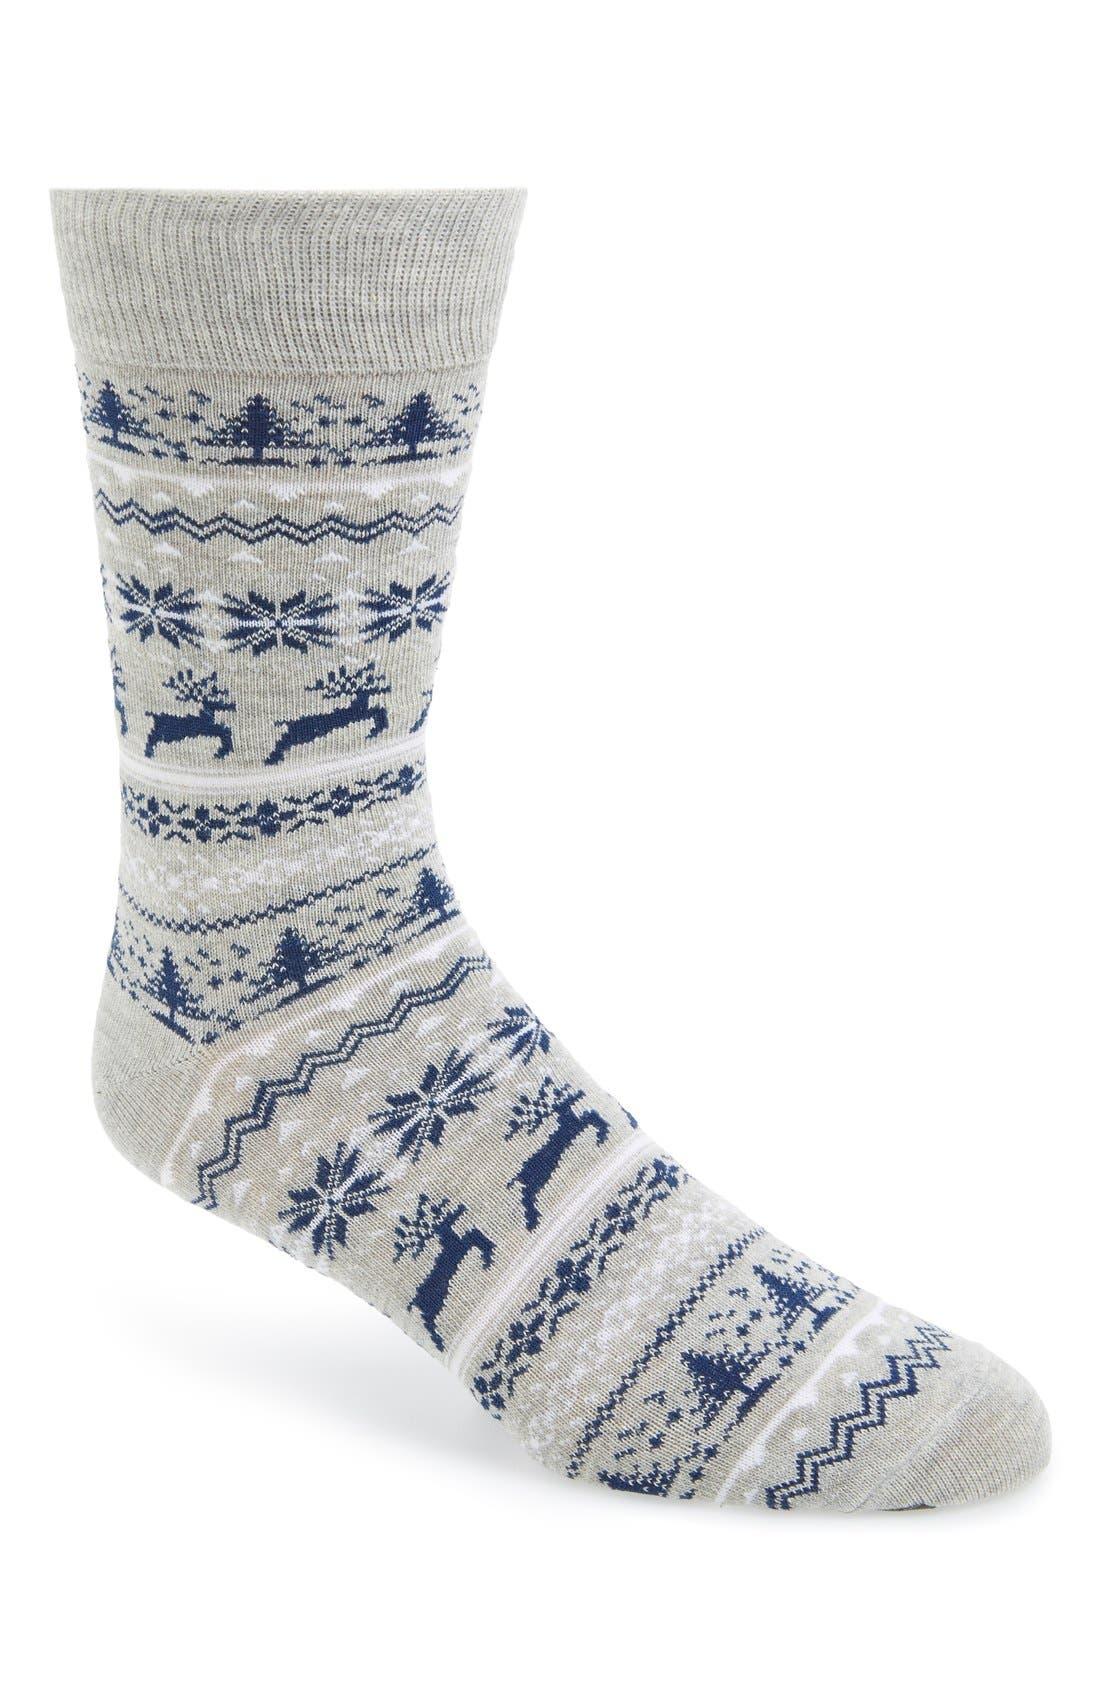 Nordic Pattern Socks,                             Main thumbnail 1, color,                             020